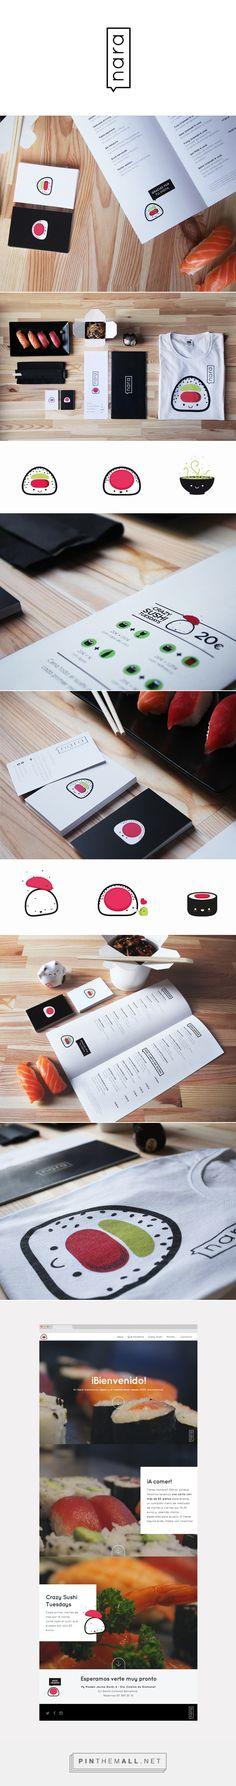 Nara Japanese by Nuria Madrid on Behance | Fivestar Branding – Design and Branding Agency & Inspiration Gallery